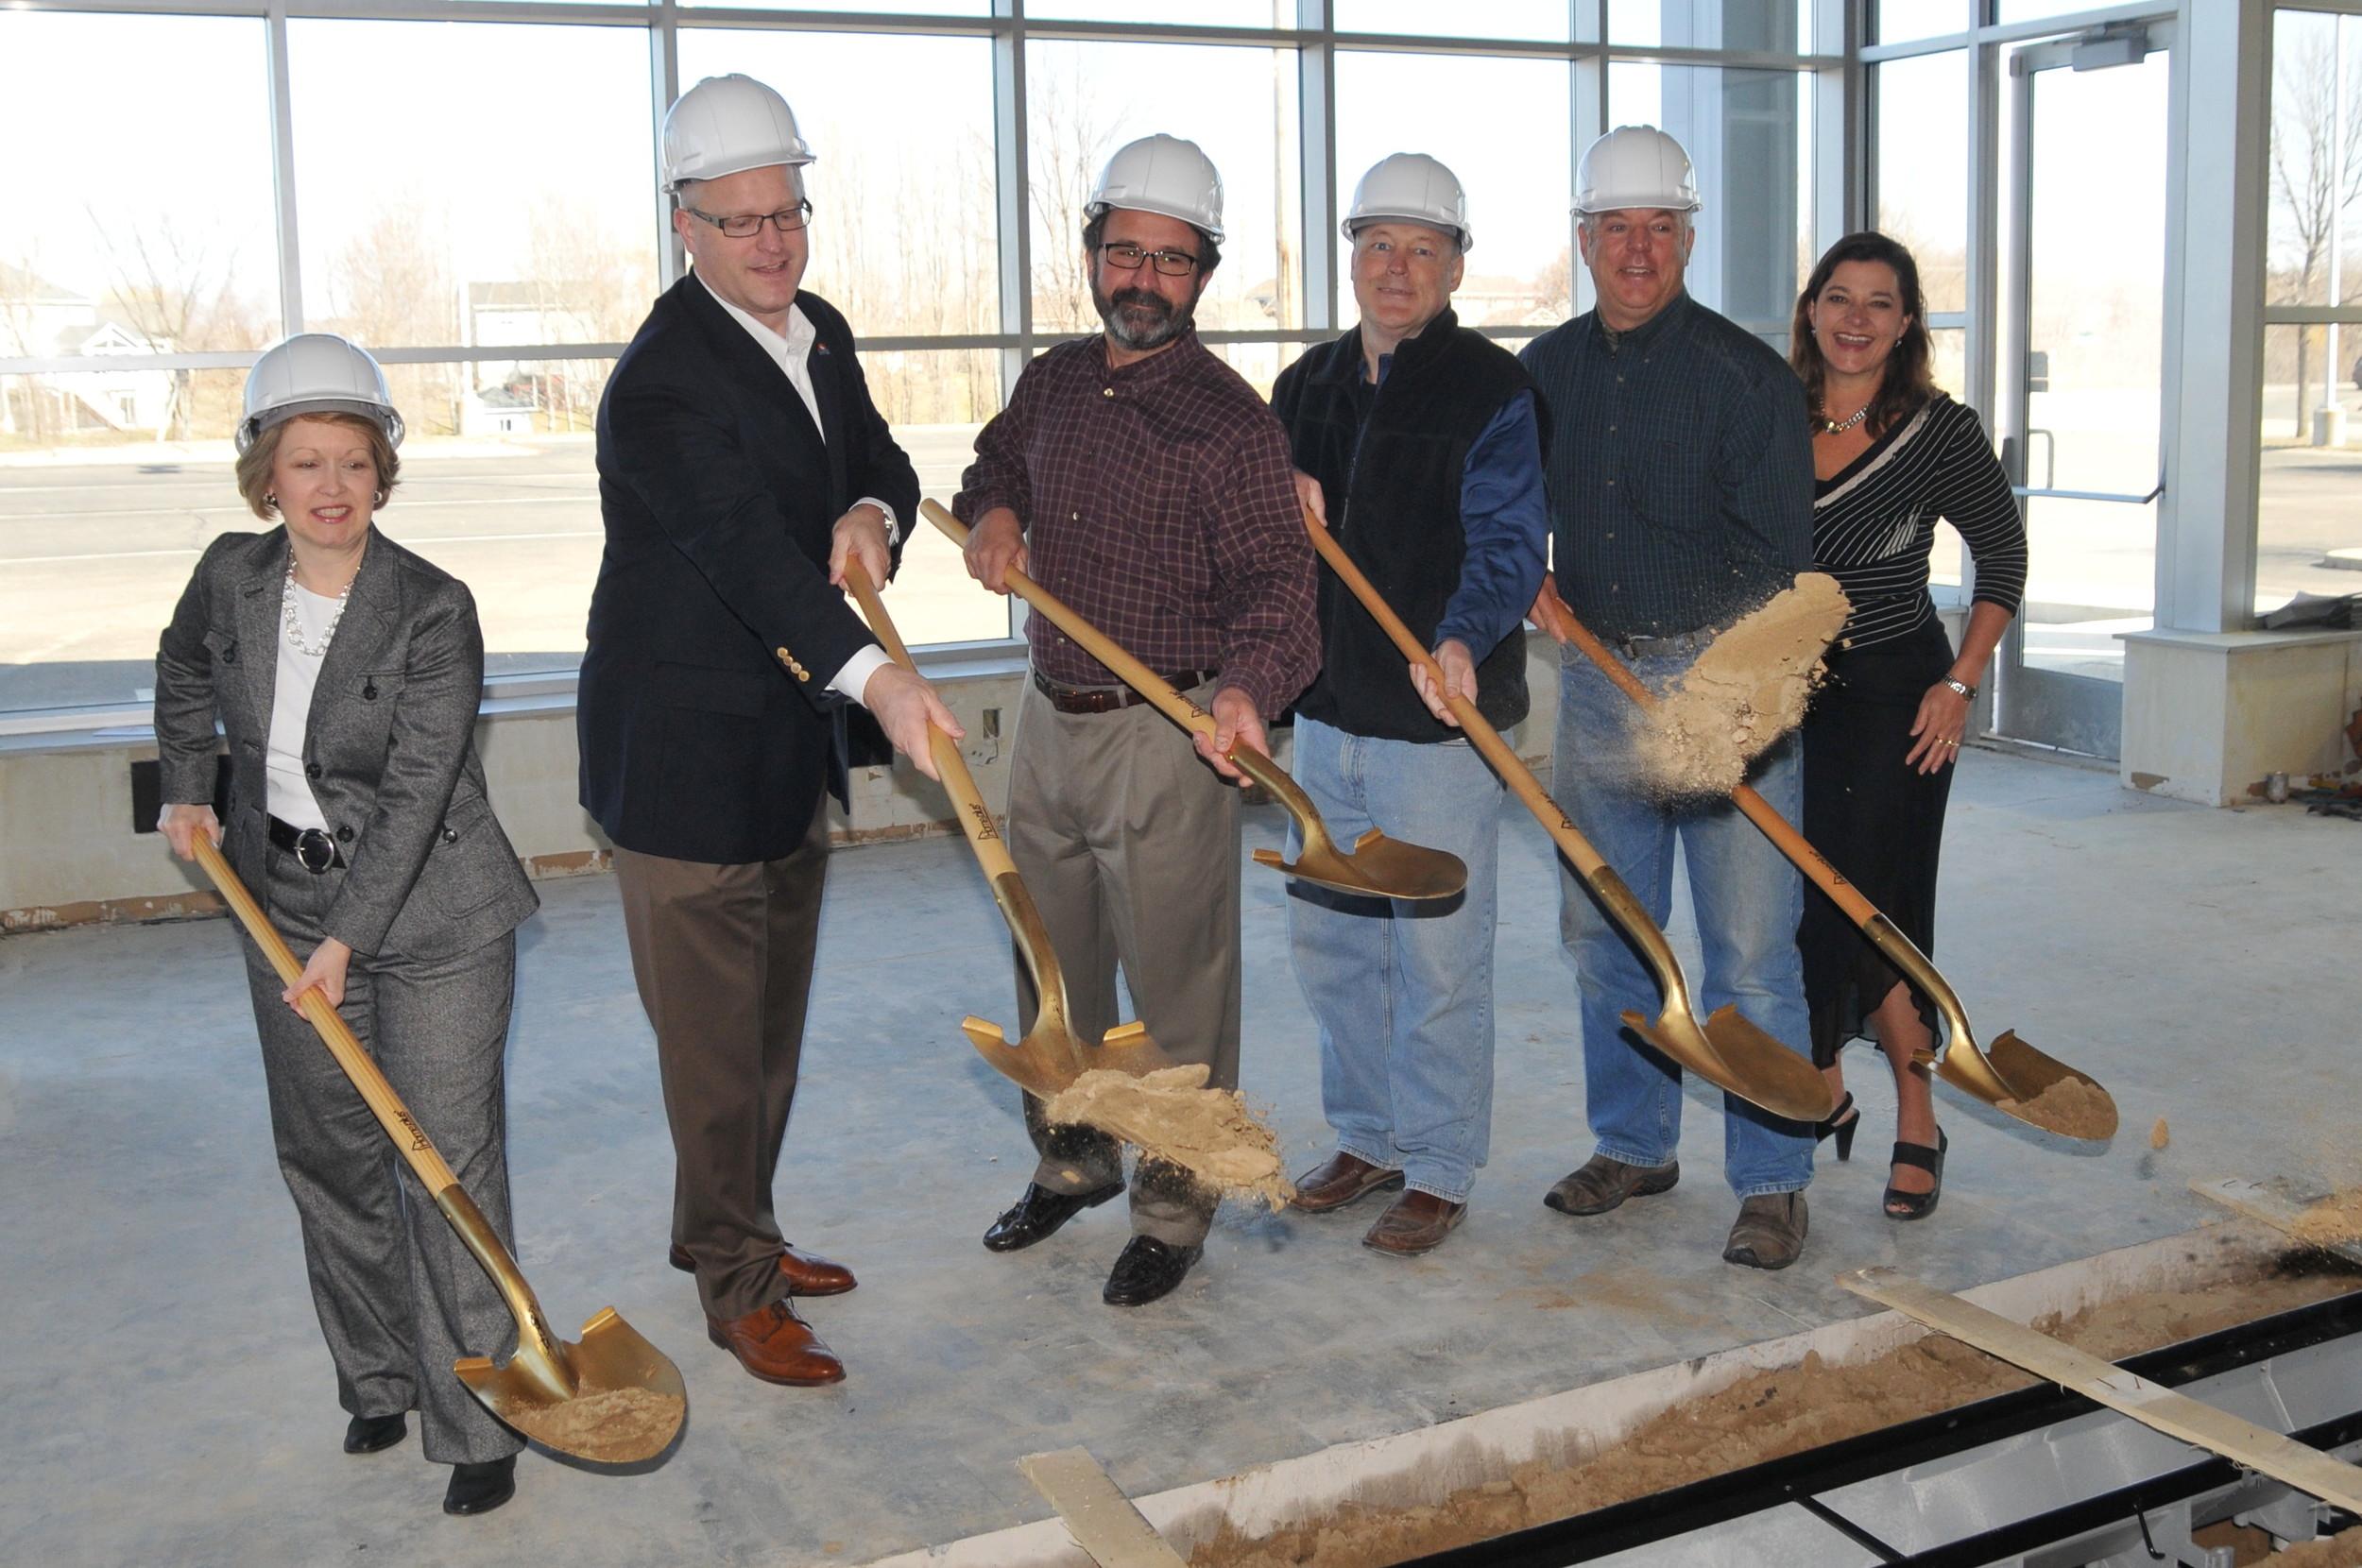 from left: Minnesota Representative Jenifer Loon, Waconia Mayor Jim Nash, Founder and Partner Bill Miller, Tim Forcier of Sondergaard Forcier Builders, Founder and Partner Tom Kullman, and Gina Holman, Founder and Manager.